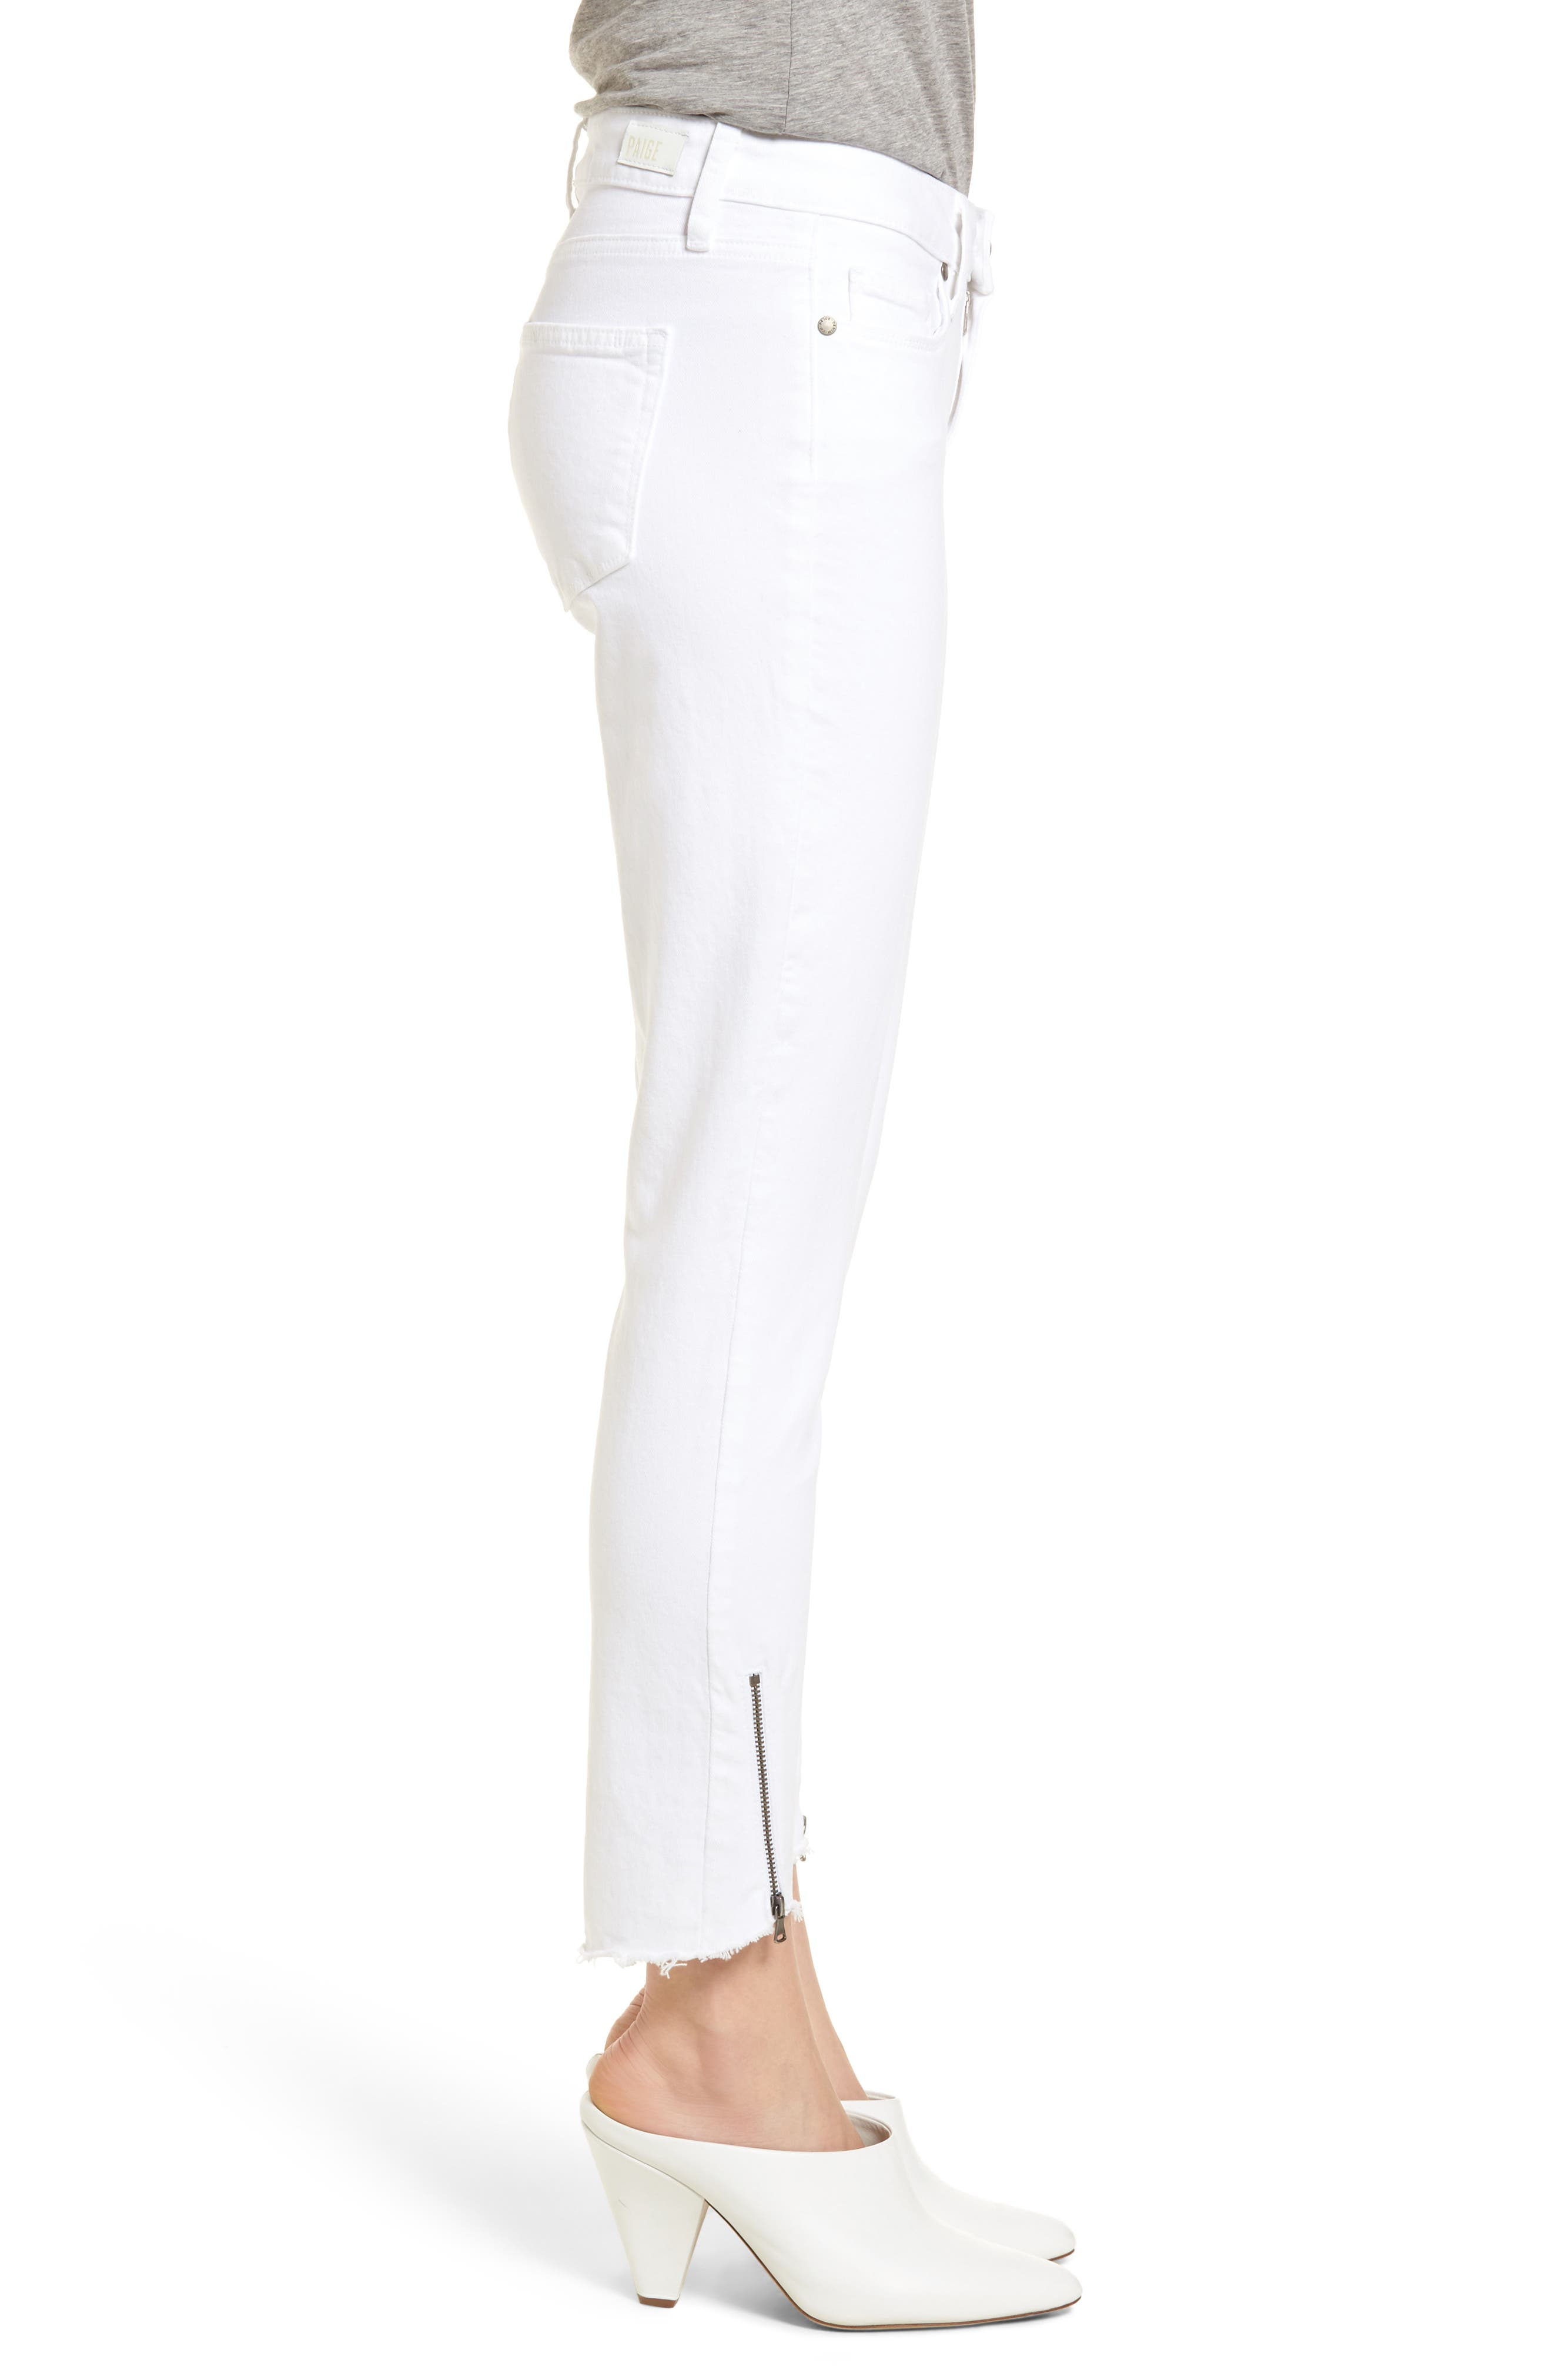 Verdugo Crop Ultra Skinny Jeans,                             Alternate thumbnail 3, color,                             Crisp White